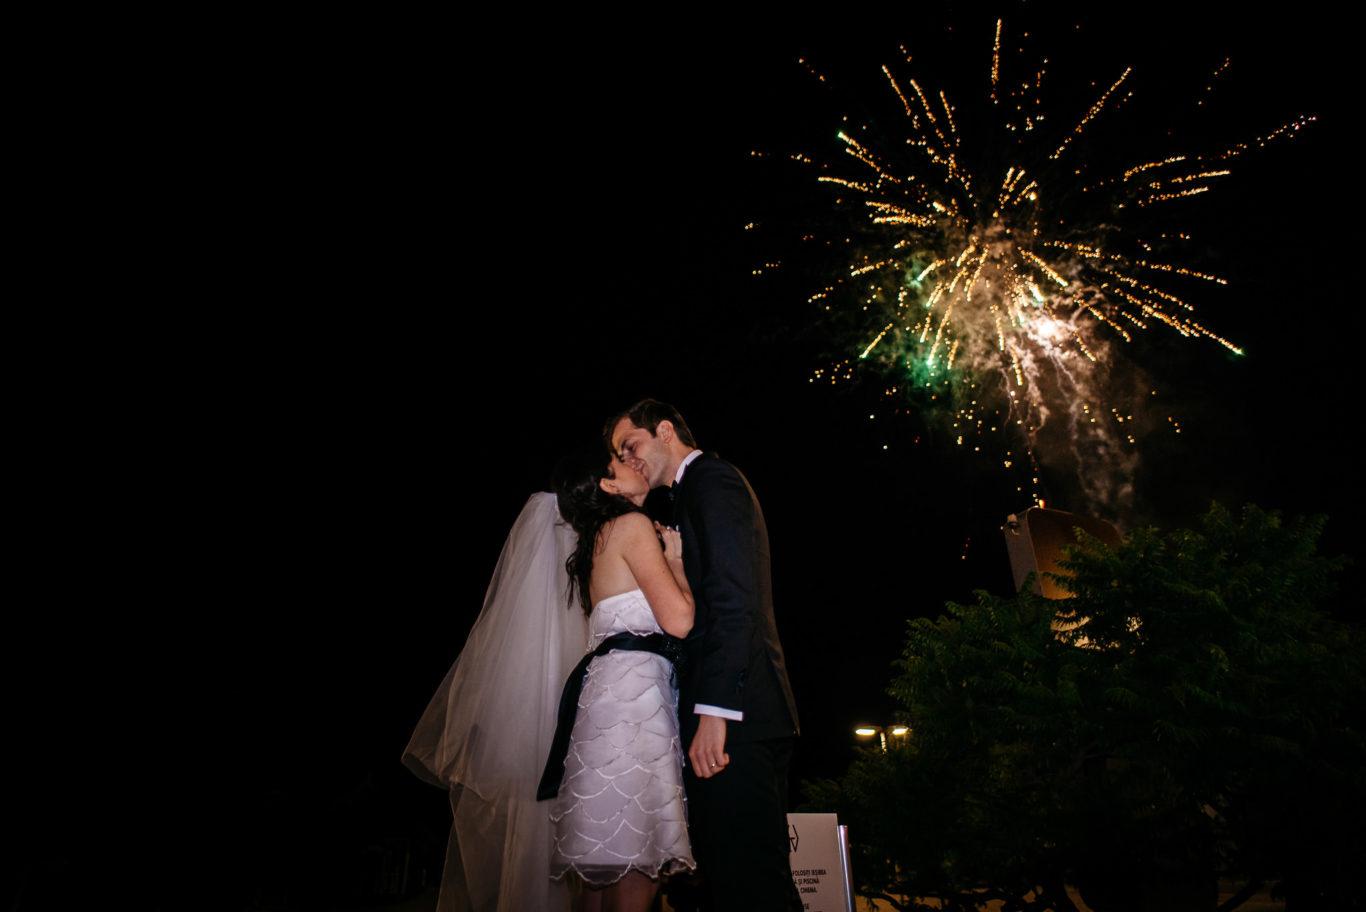 0905-Fotografie-nunta-Simona-Valentin-fotograf-Ciprian-Dumitrescu-DSC_2659